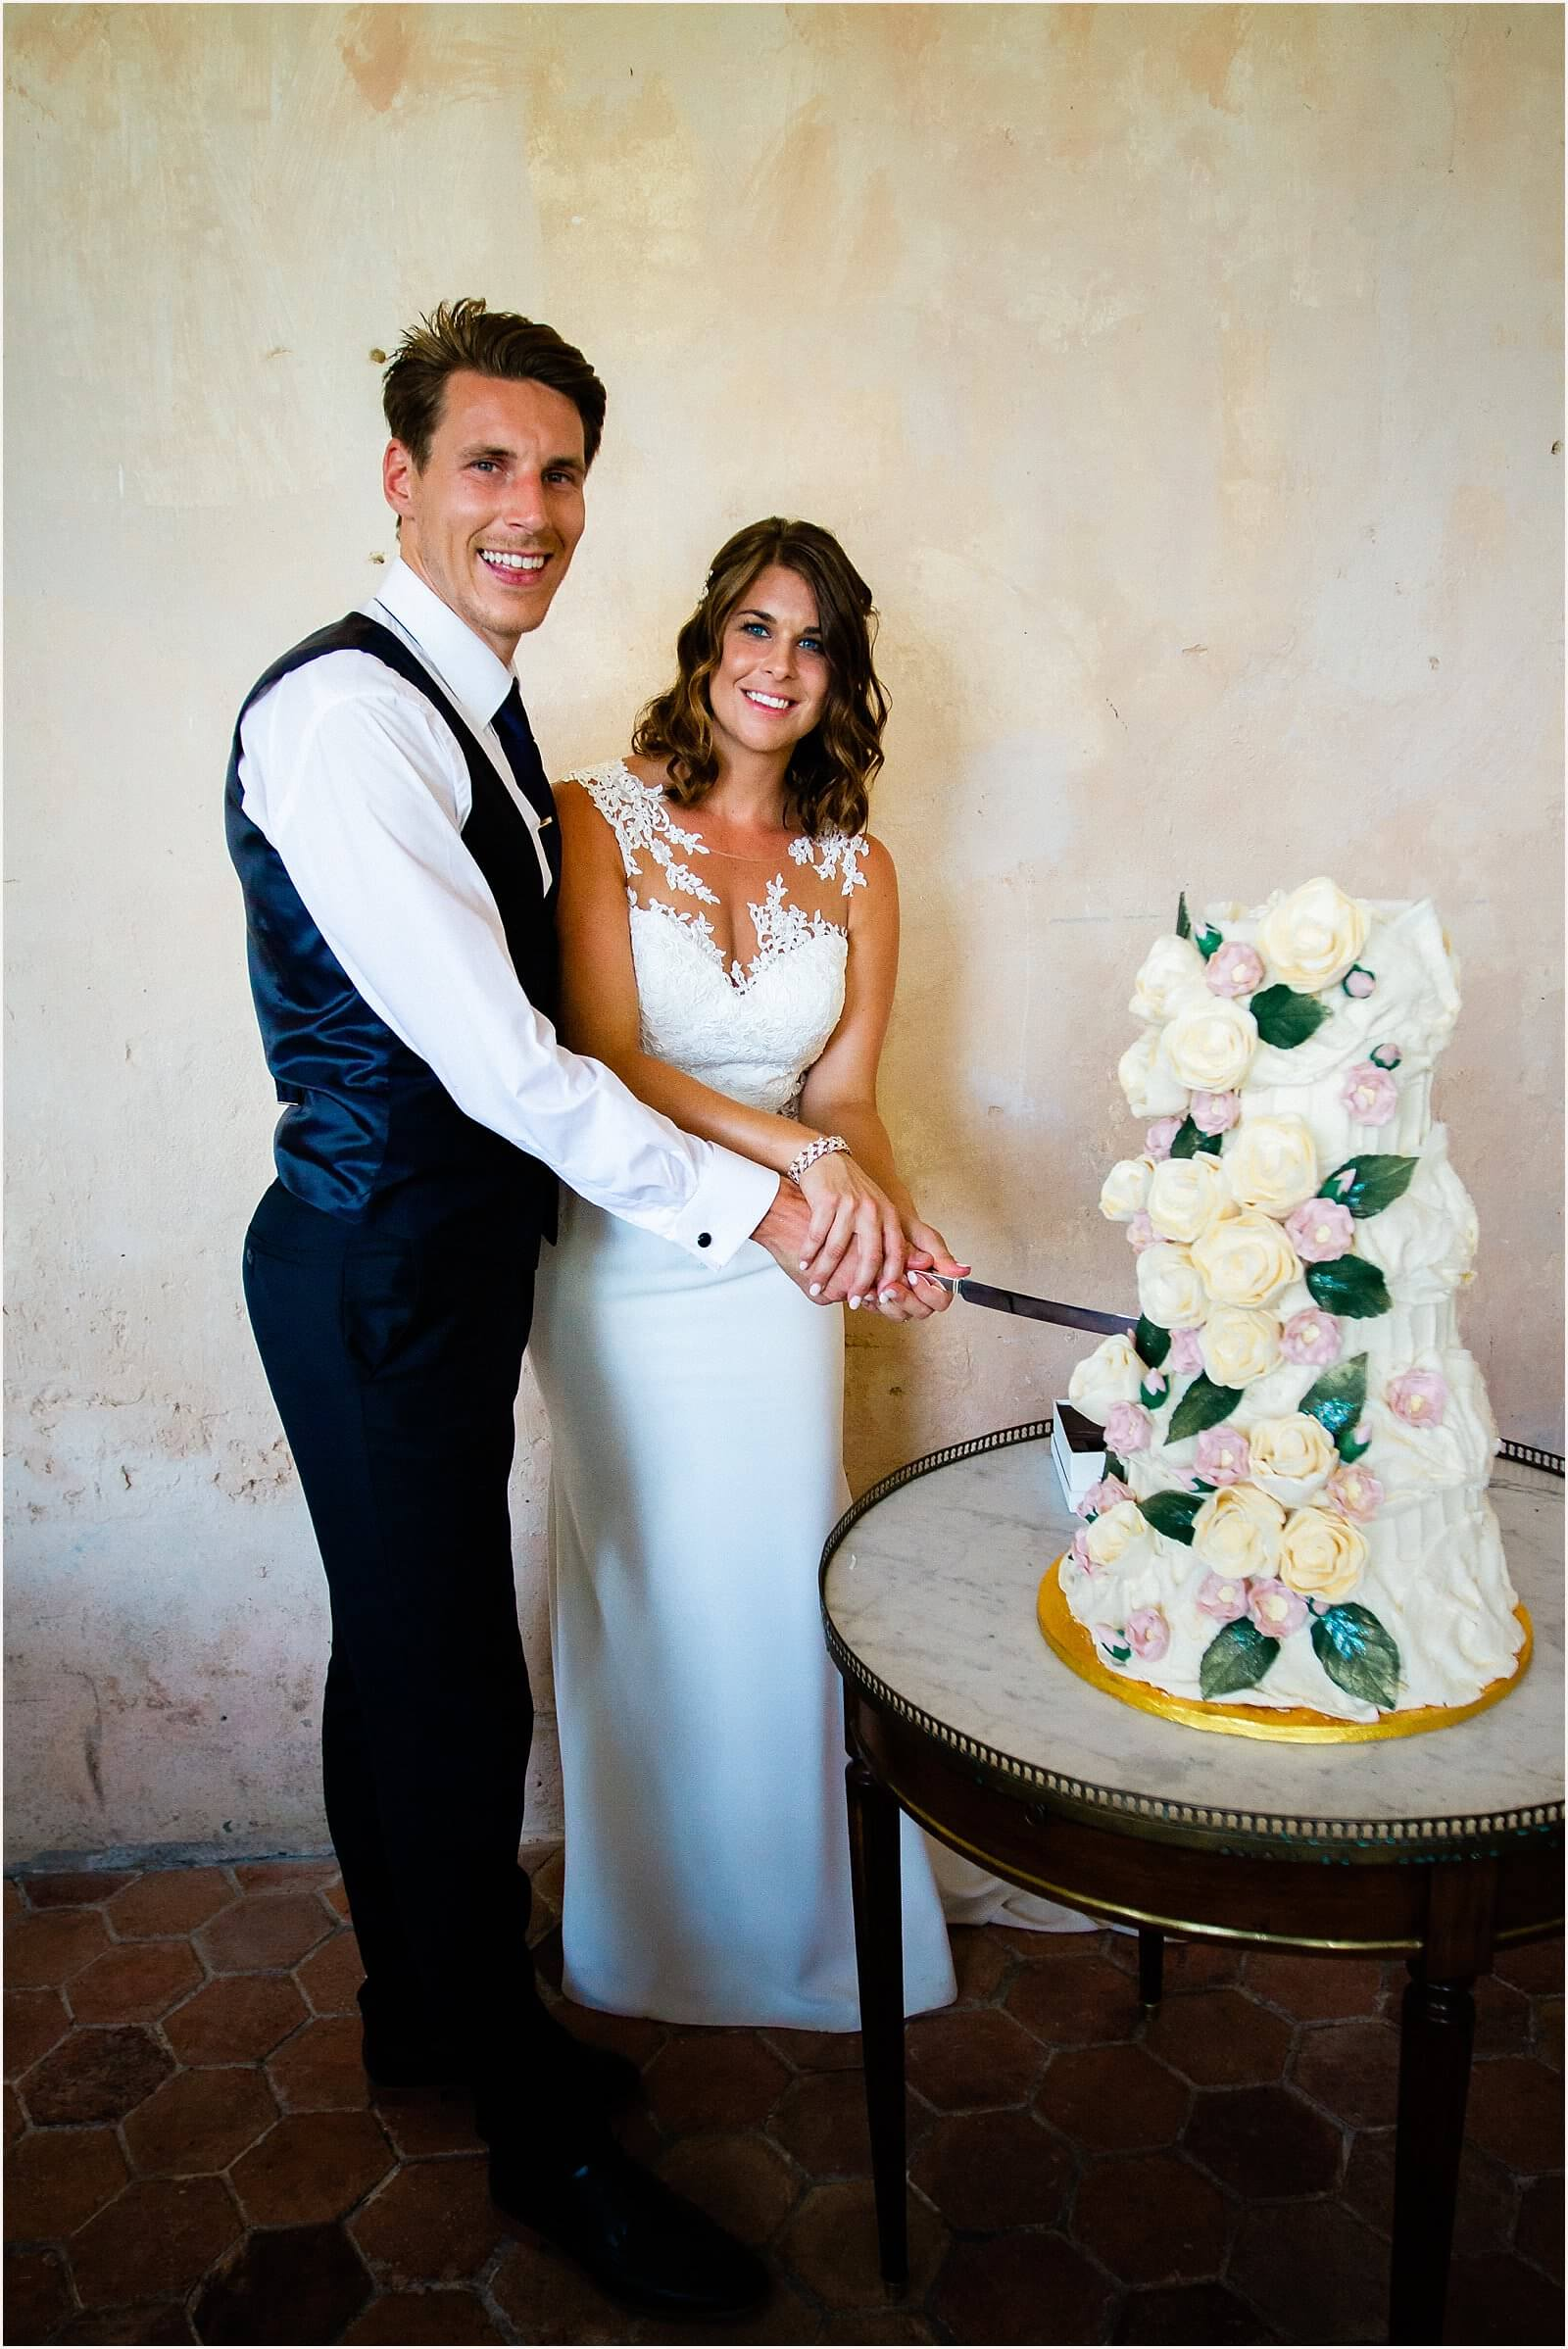 Chateau de Courtomer Wedding | Chantel & Evan 52